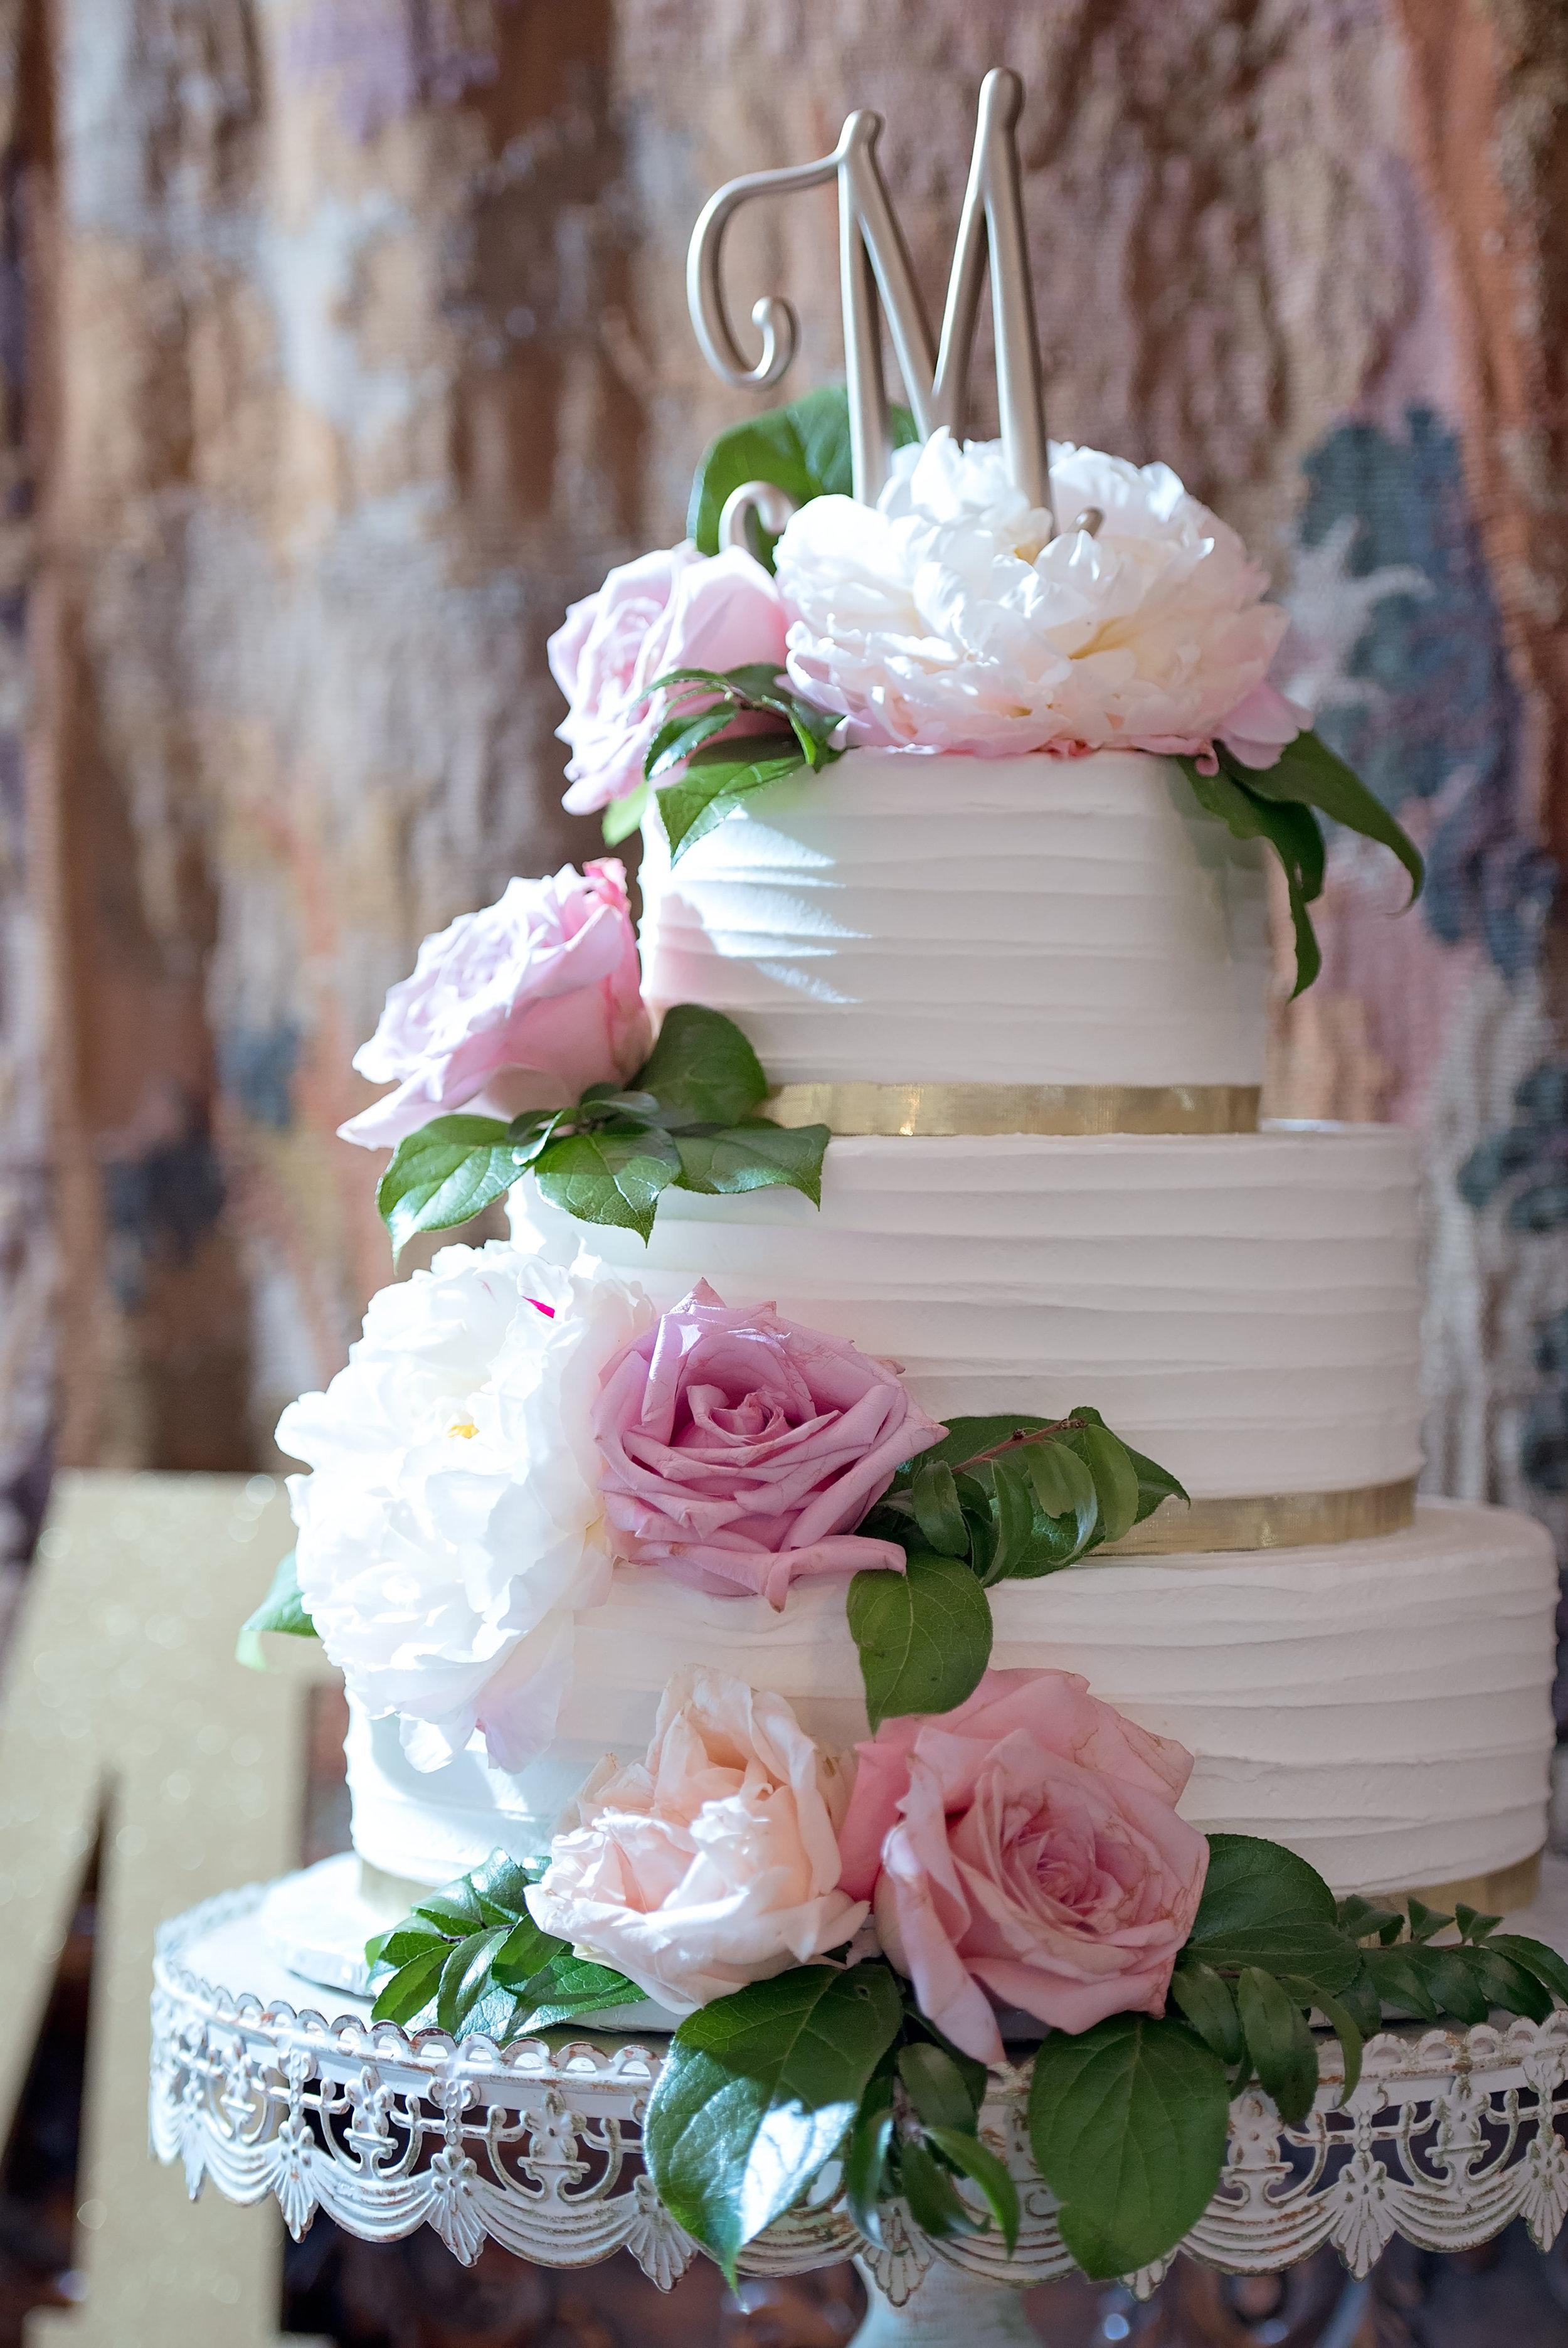 Blush and White Wedding Cake - Gorgeous Blush and White Wedding - Los Feliz Wedding